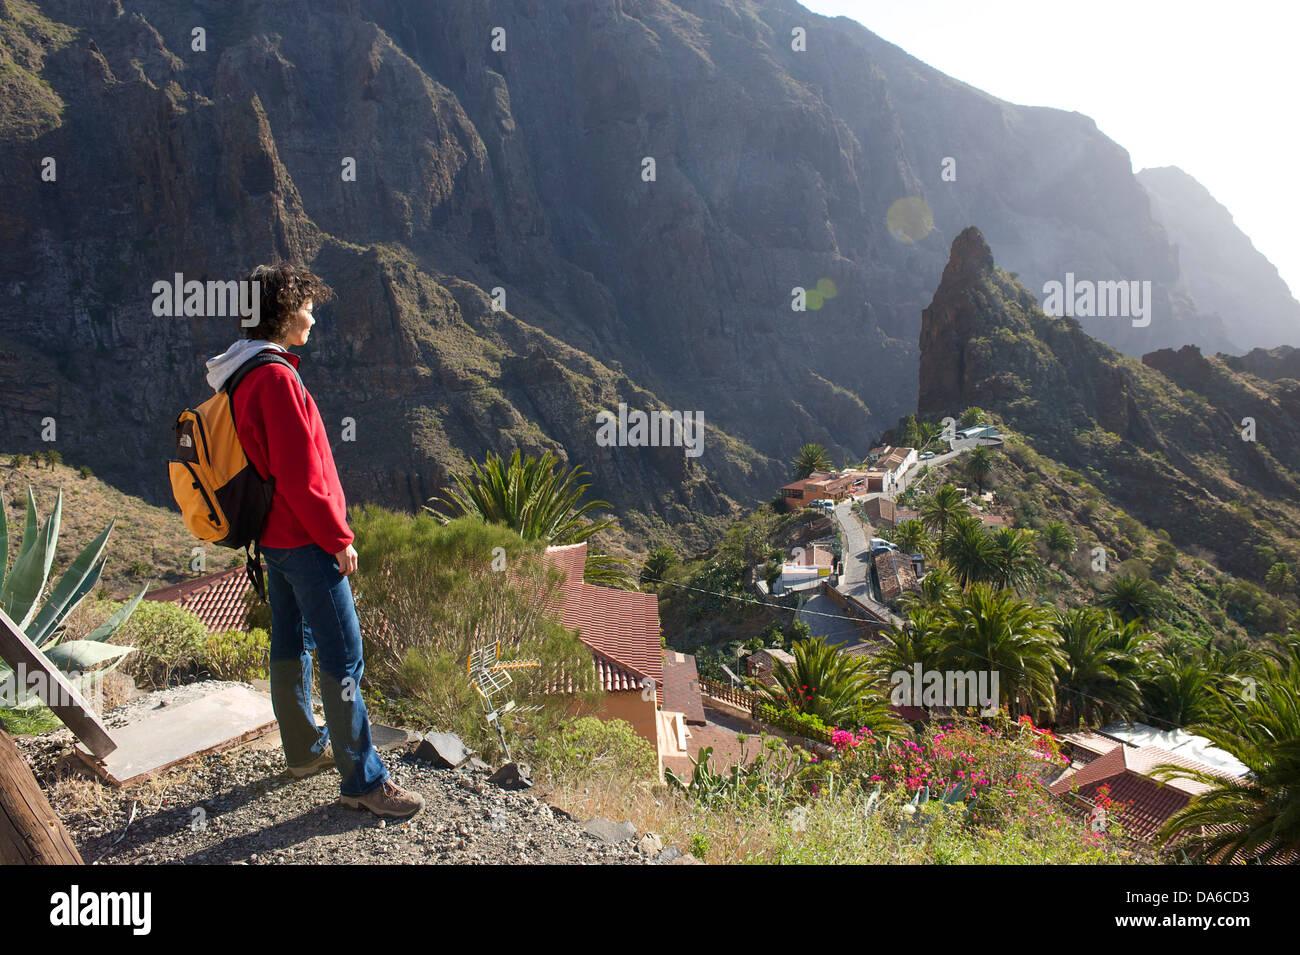 Tenerife, Tenerife, Islas Canarias, islas Canarias, España, español, Europa, Masca, paisaje de montaña, Imagen De Stock